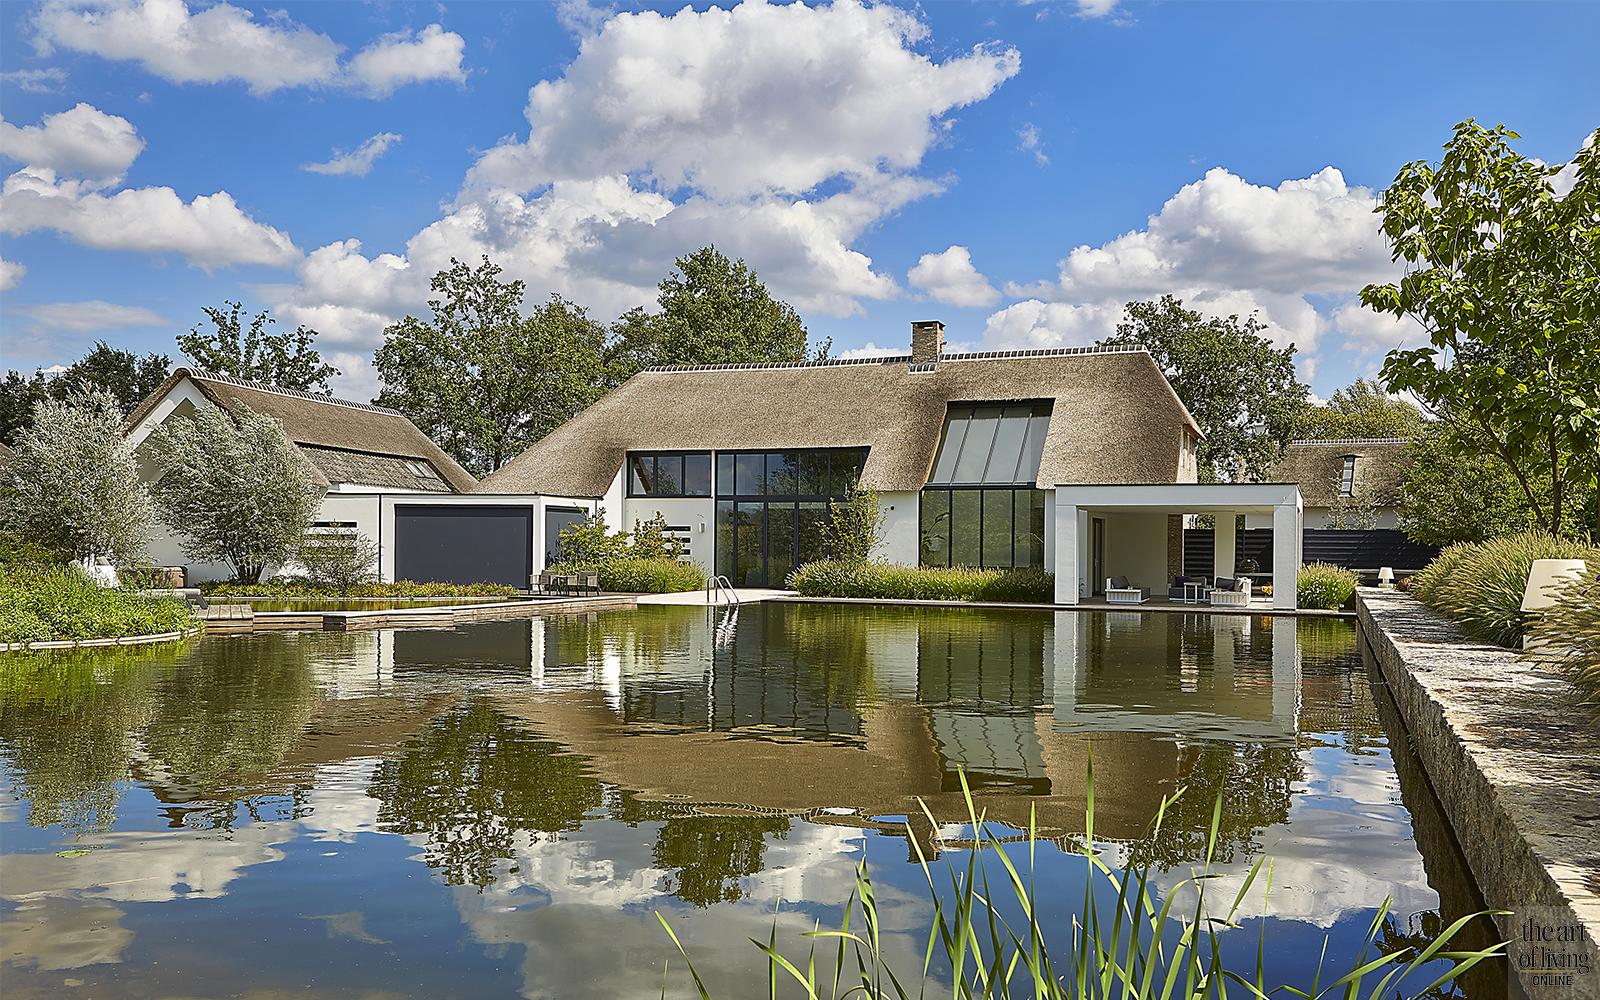 Villa bouwen, Nieuwbouwvilla, Nieuwbouw, Villa, Landhuis, Rieten dak, Moderne architectuur, Landelijk wonen, Exterieur